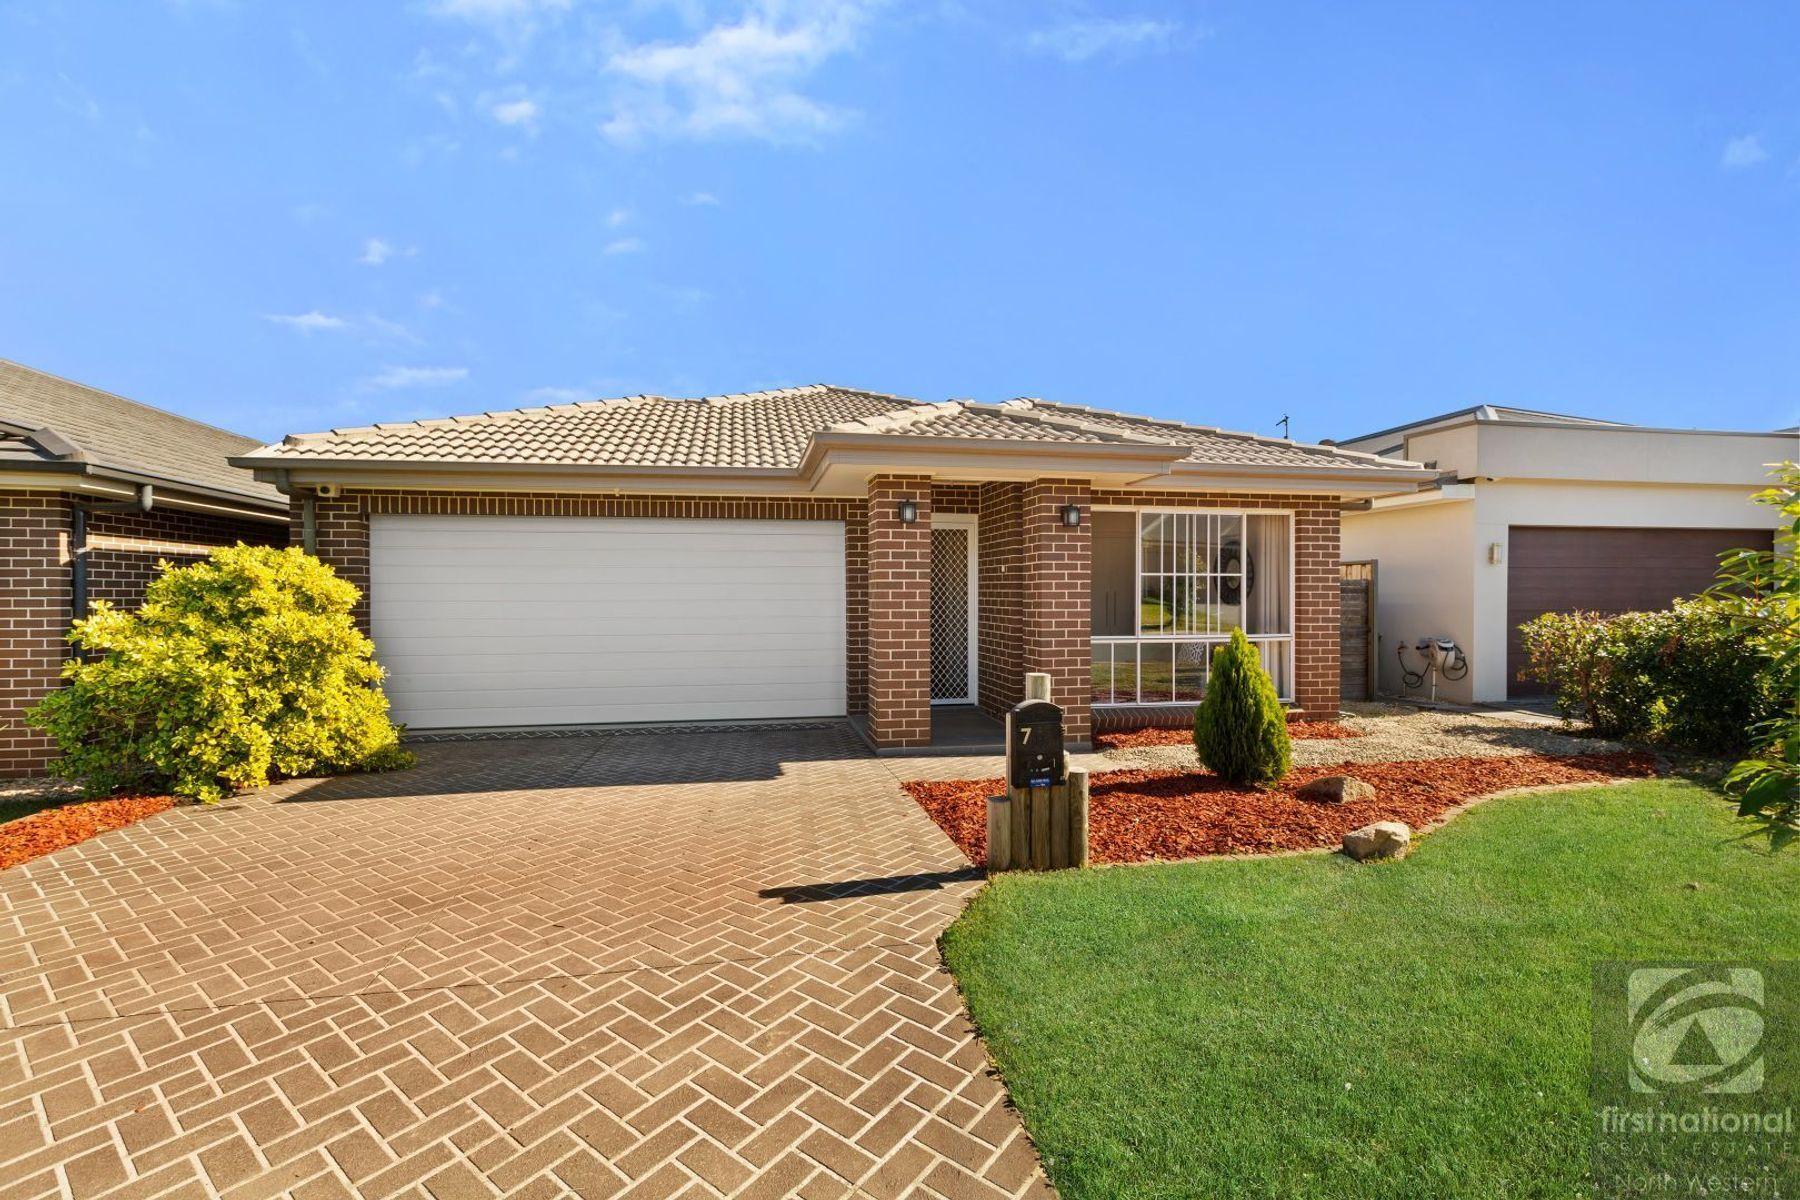 7 Landon Street, Schofields, NSW 2762